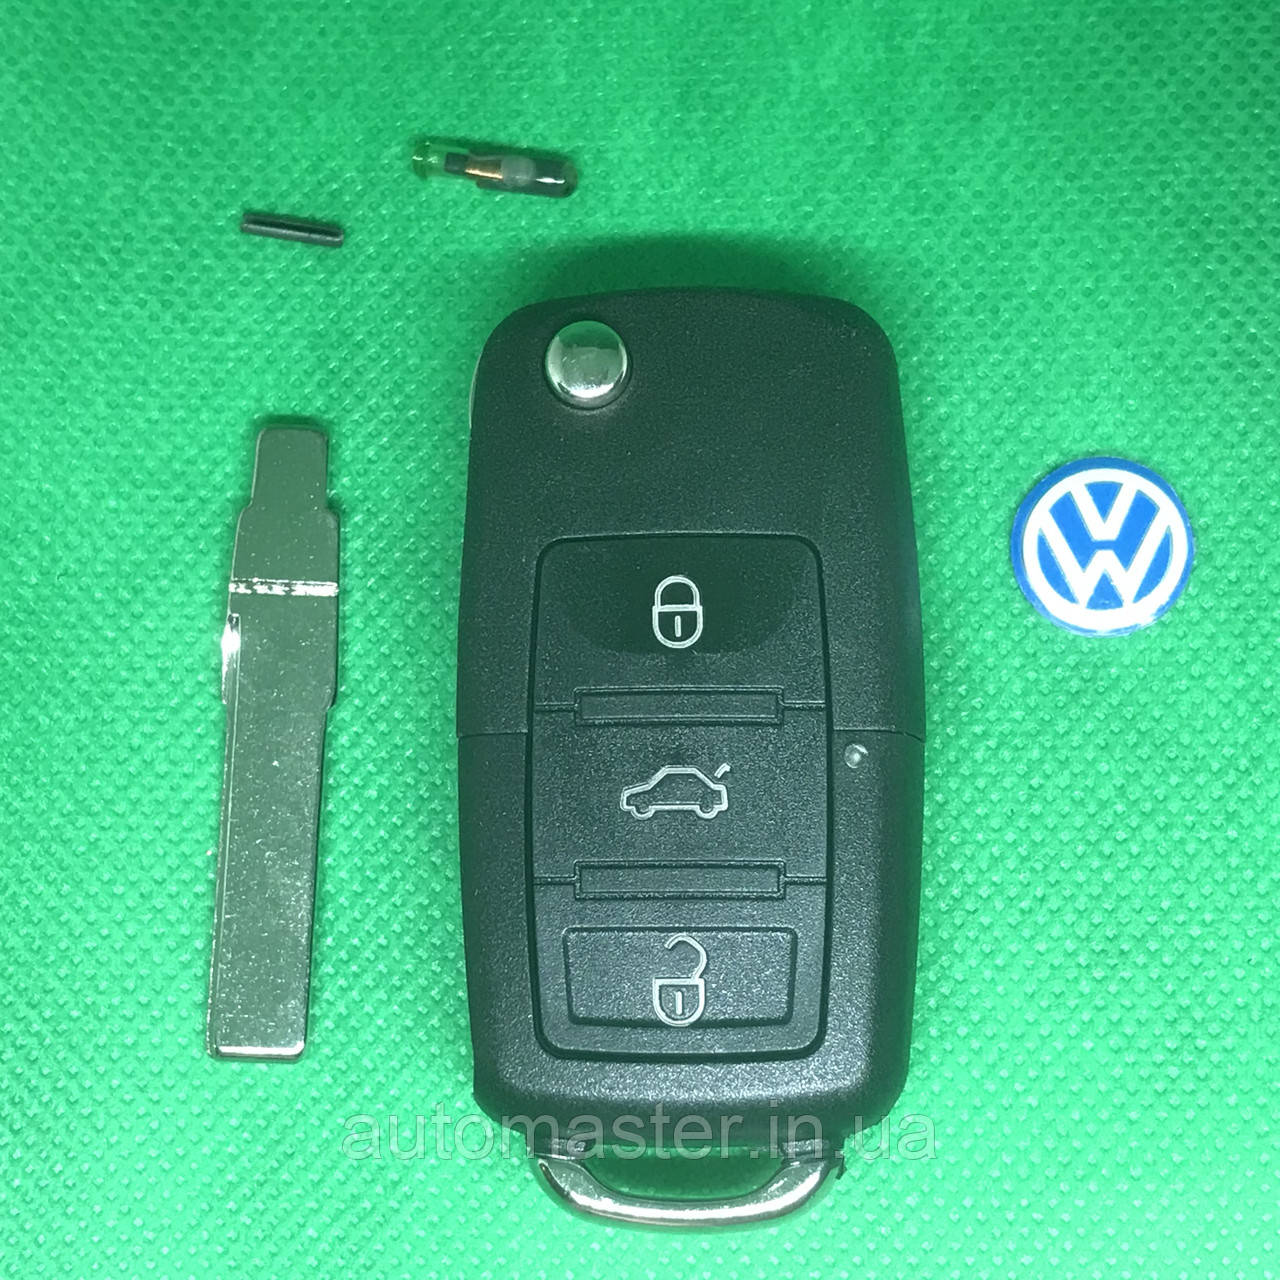 Ключ Фольксваген Volkswagen Passat, Golf,Jetta , 3 кнопки 1K0959753N ,с частотой 433 MHz ID48